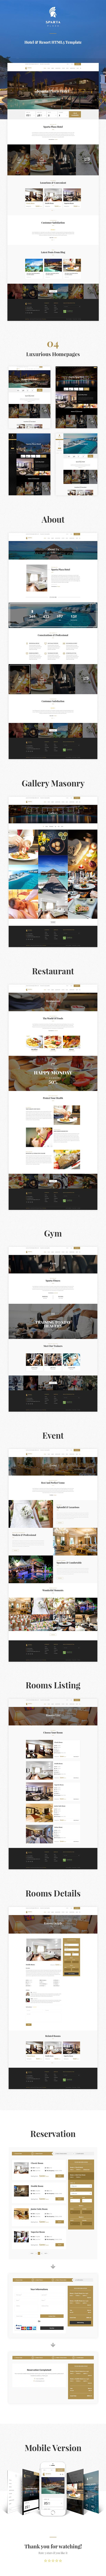 Sparta | Hotel & Resort HTML5 Template - 1